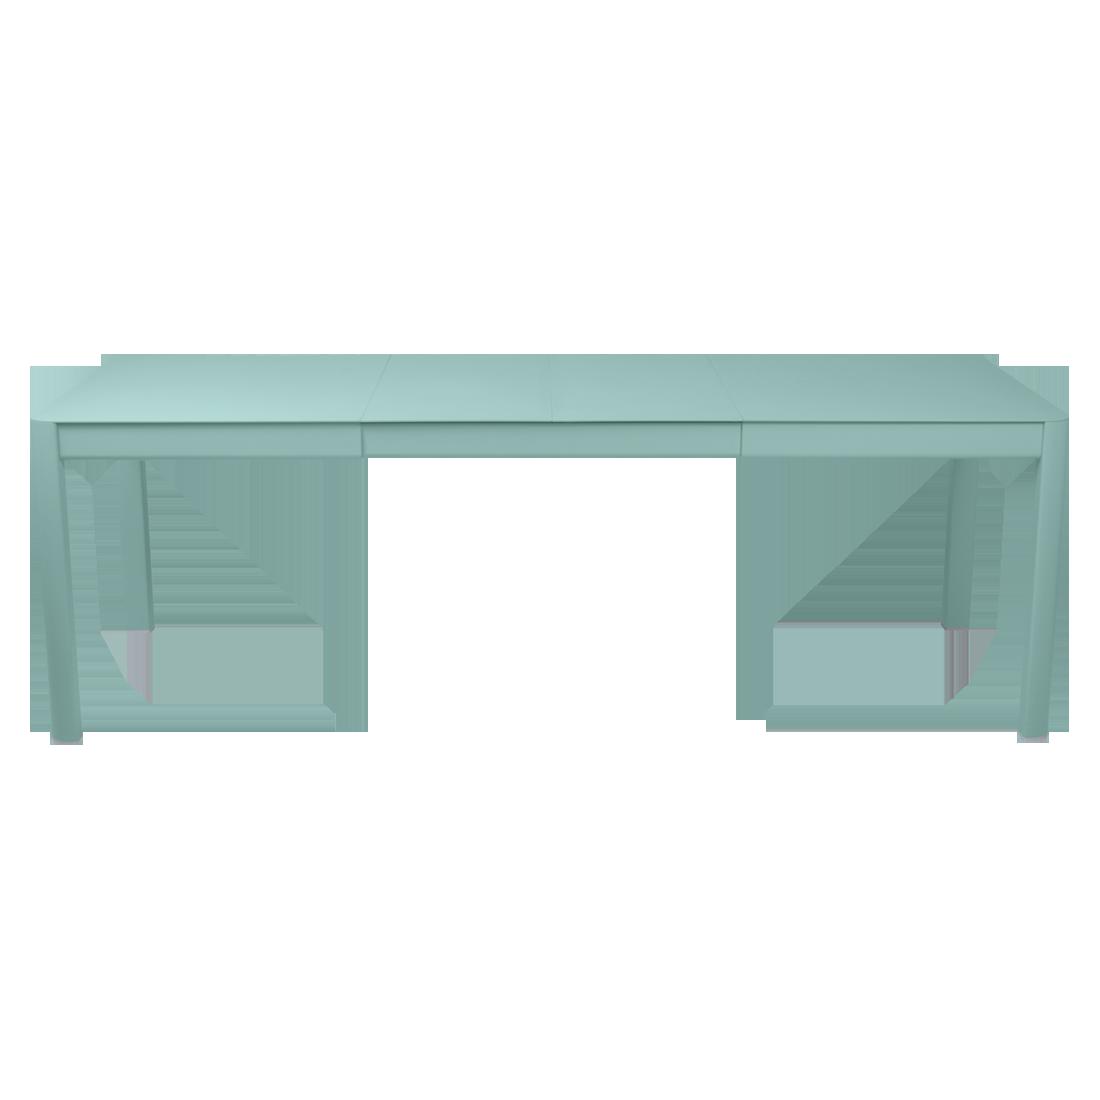 table de jardin bleu, table metal allonge, table metal a rallonge, table metal rectangulaire, table fermob allonge